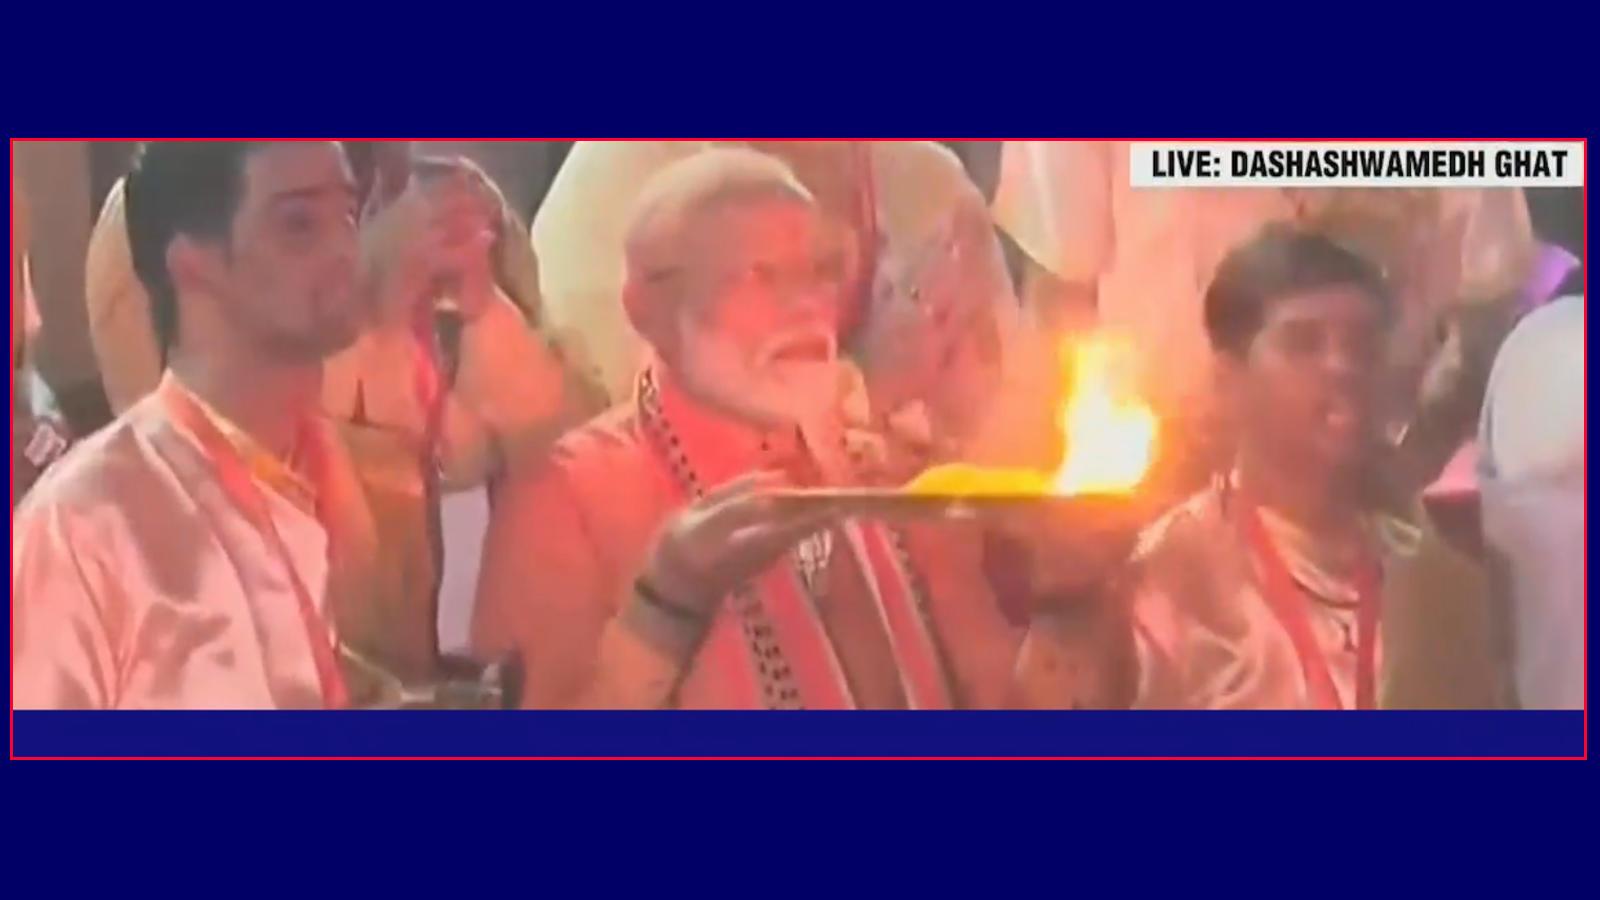 watch-pm-narendra-modi-offers-prayers-at-dashashwamedh-ghat